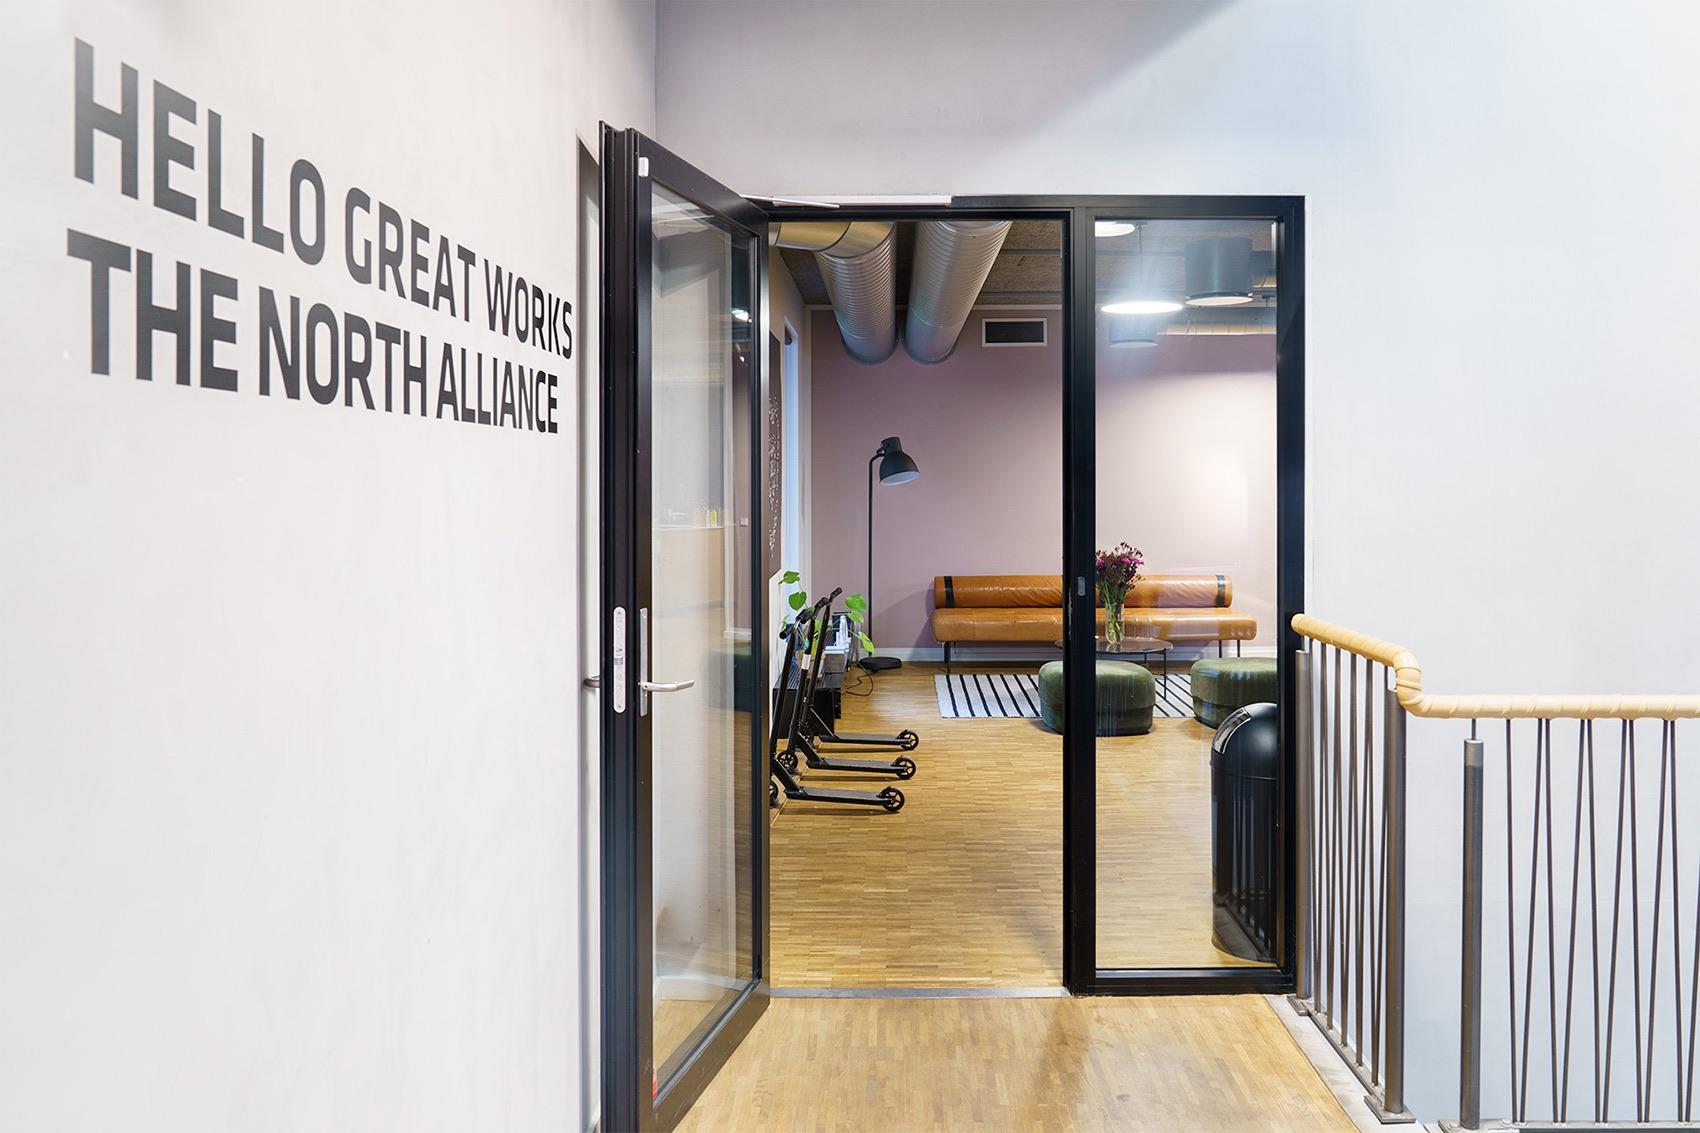 hello-great-works-copenhagen-office-1